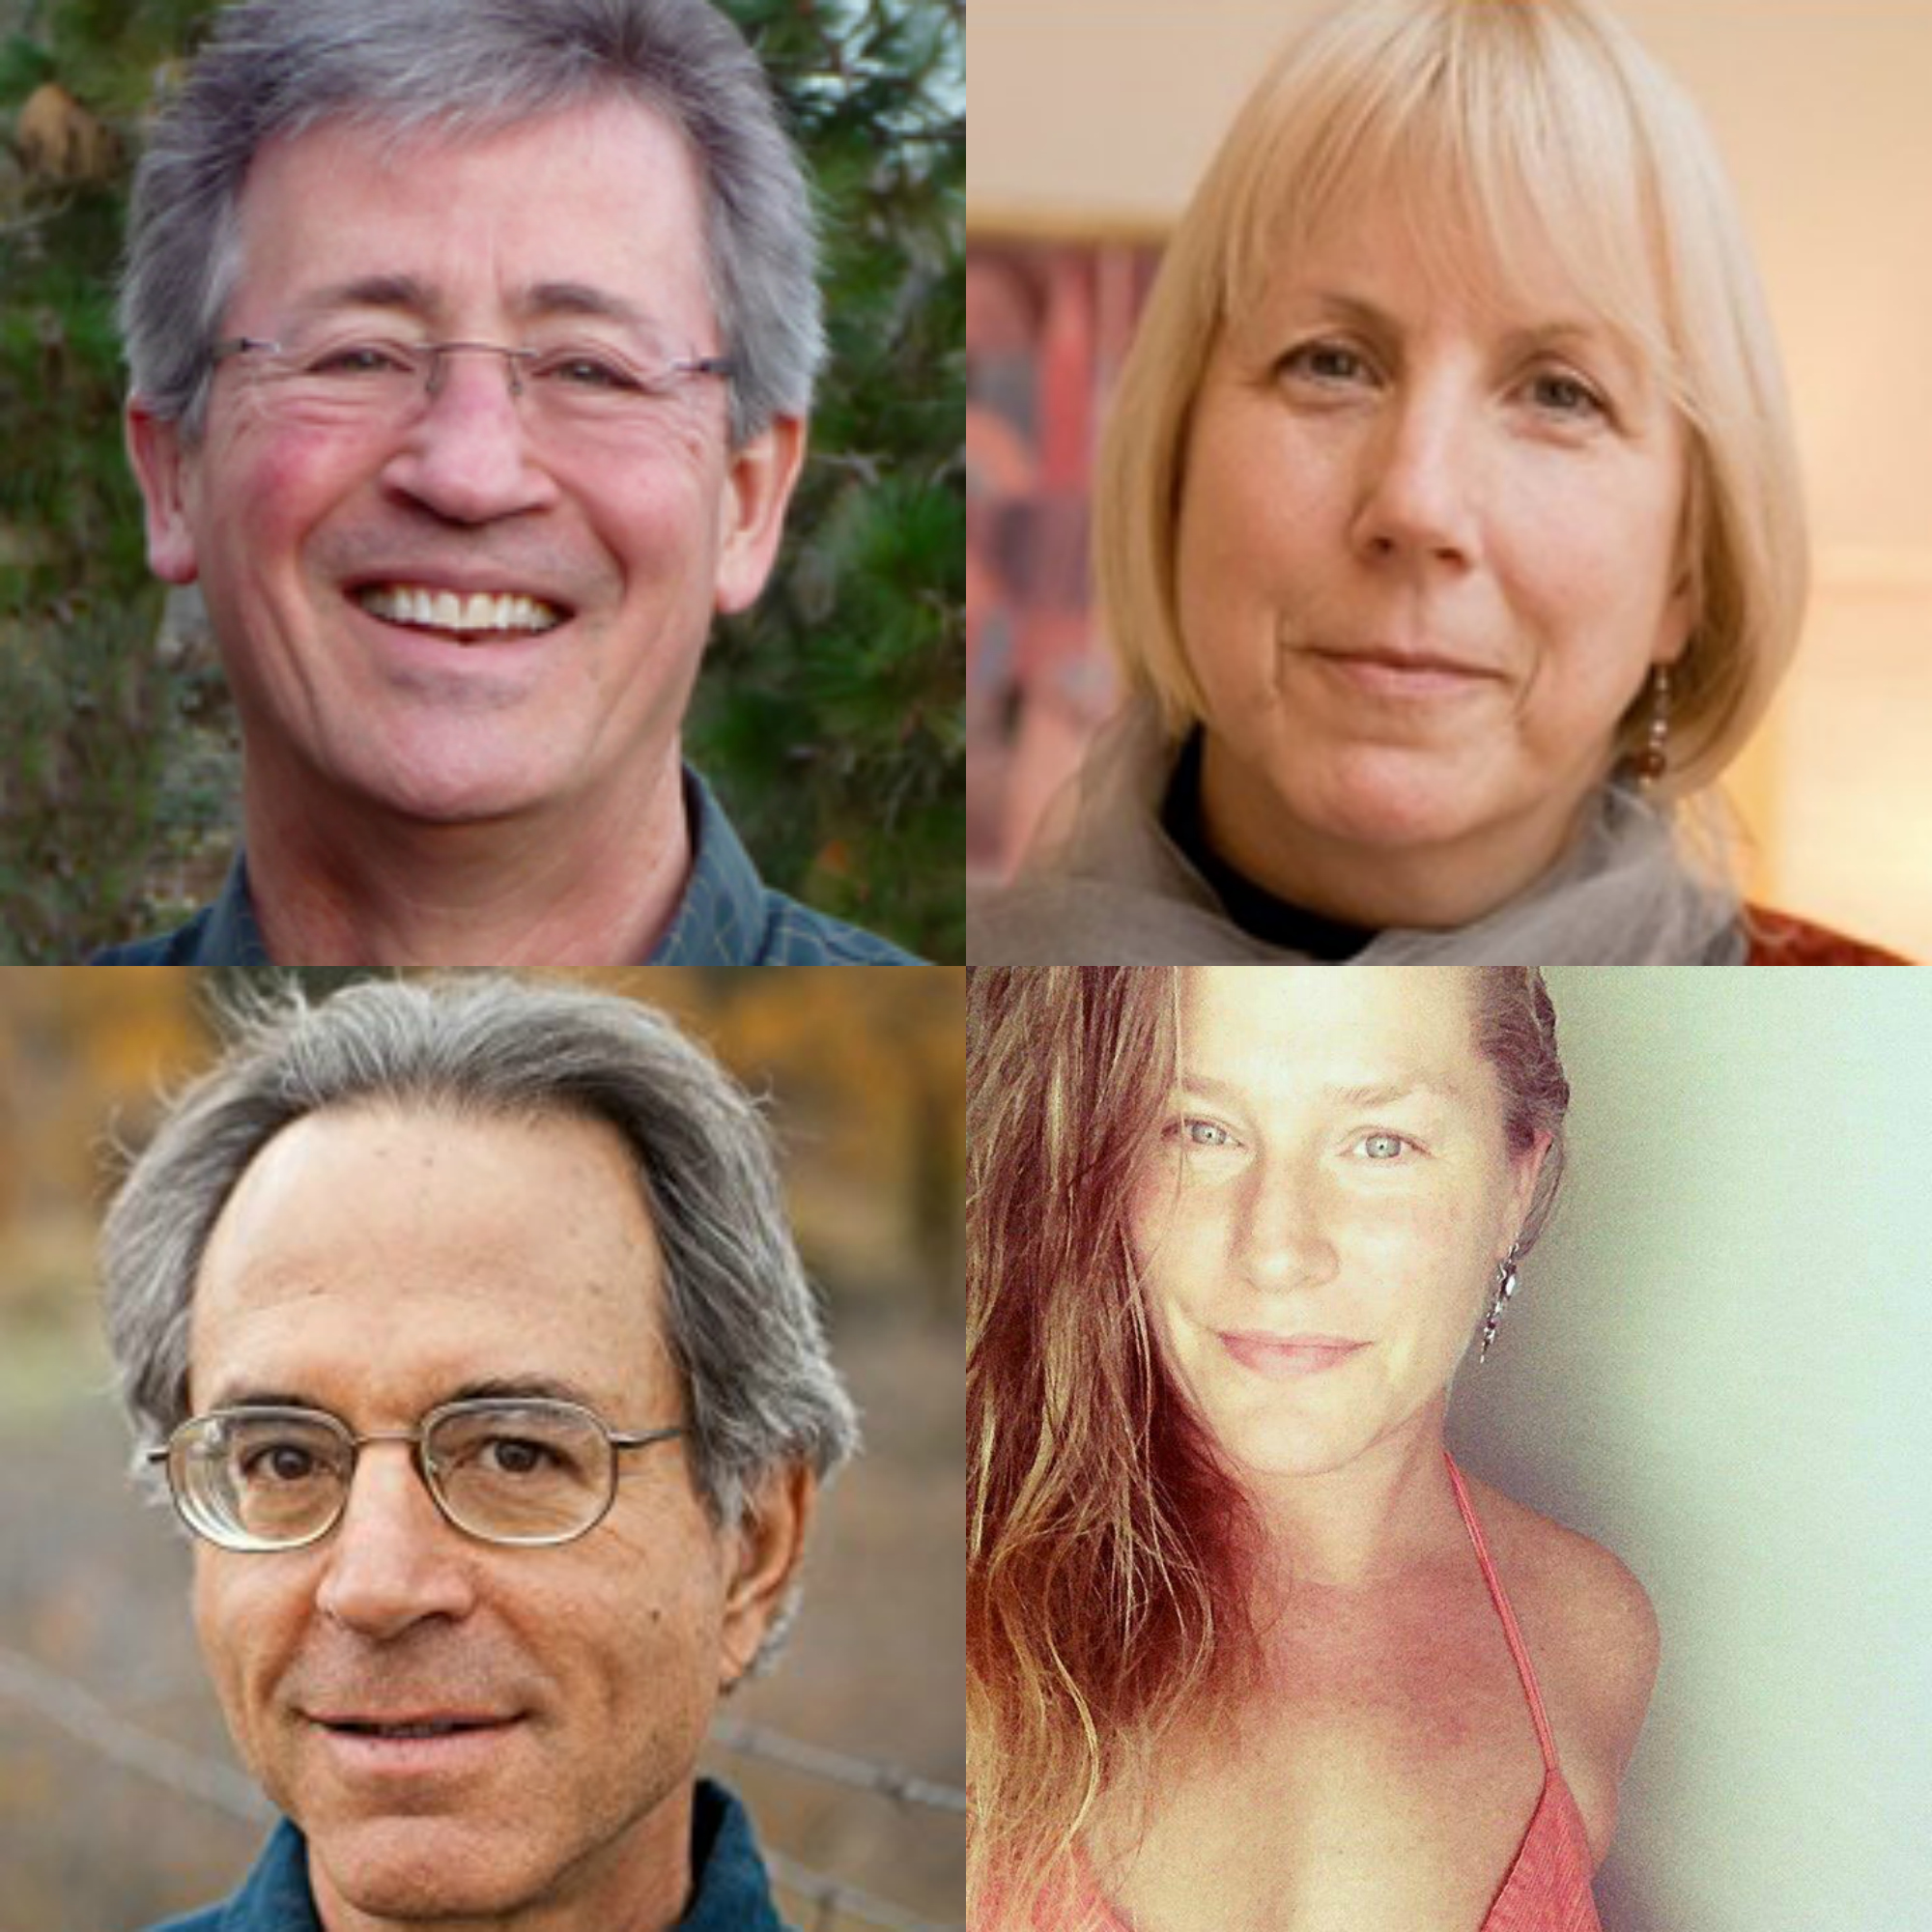 CHRIS BACHE, Ph.D., JANIS PHELPS, Ph.D., & RICK STRASSMAN, M.D.